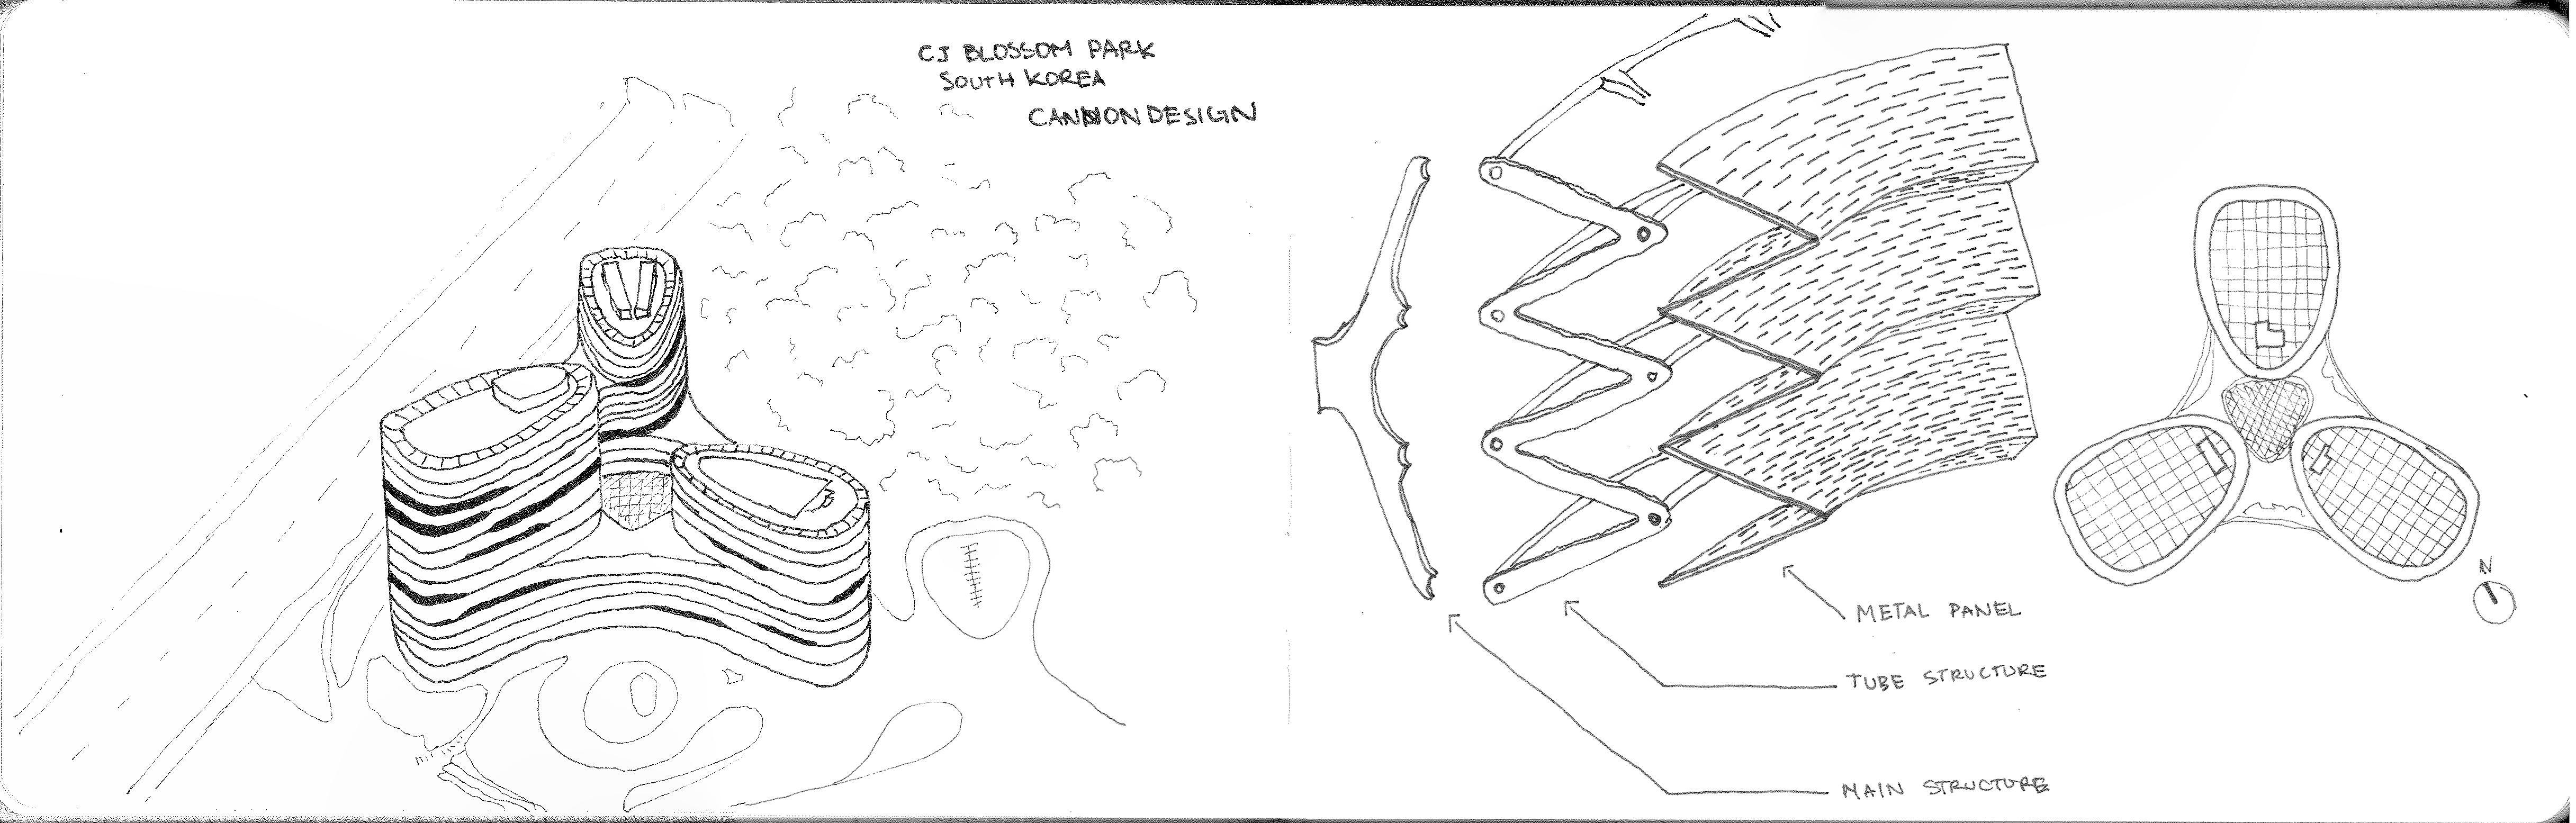 Guzman_CannonDesign_Sketch